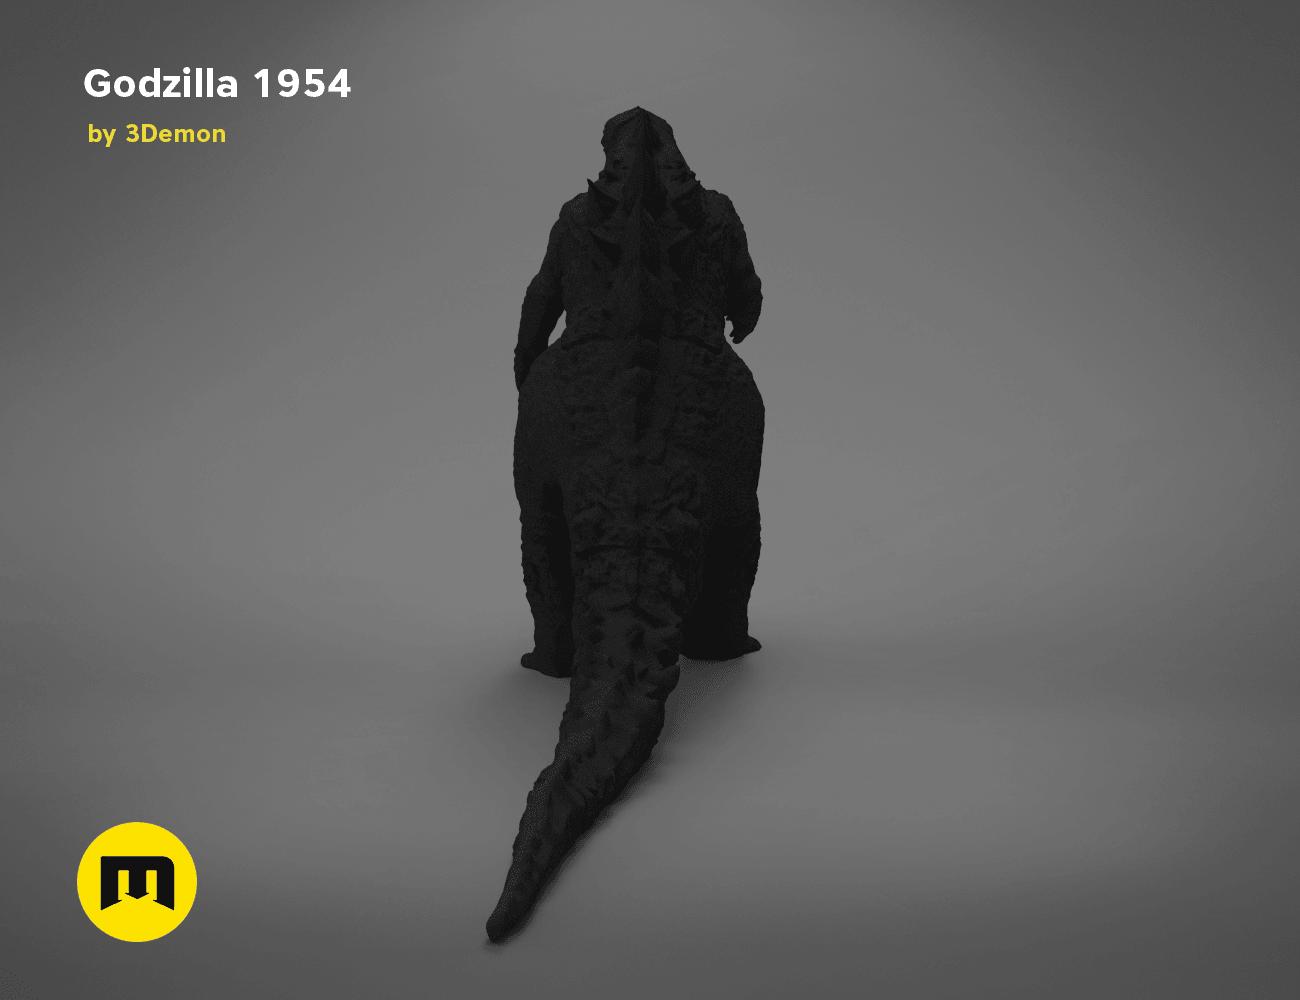 godzilla-black-japanese-back.196.png Download free OBJ file Godzilla 1954 figure and bottle opener • 3D printer model, 3D-mon